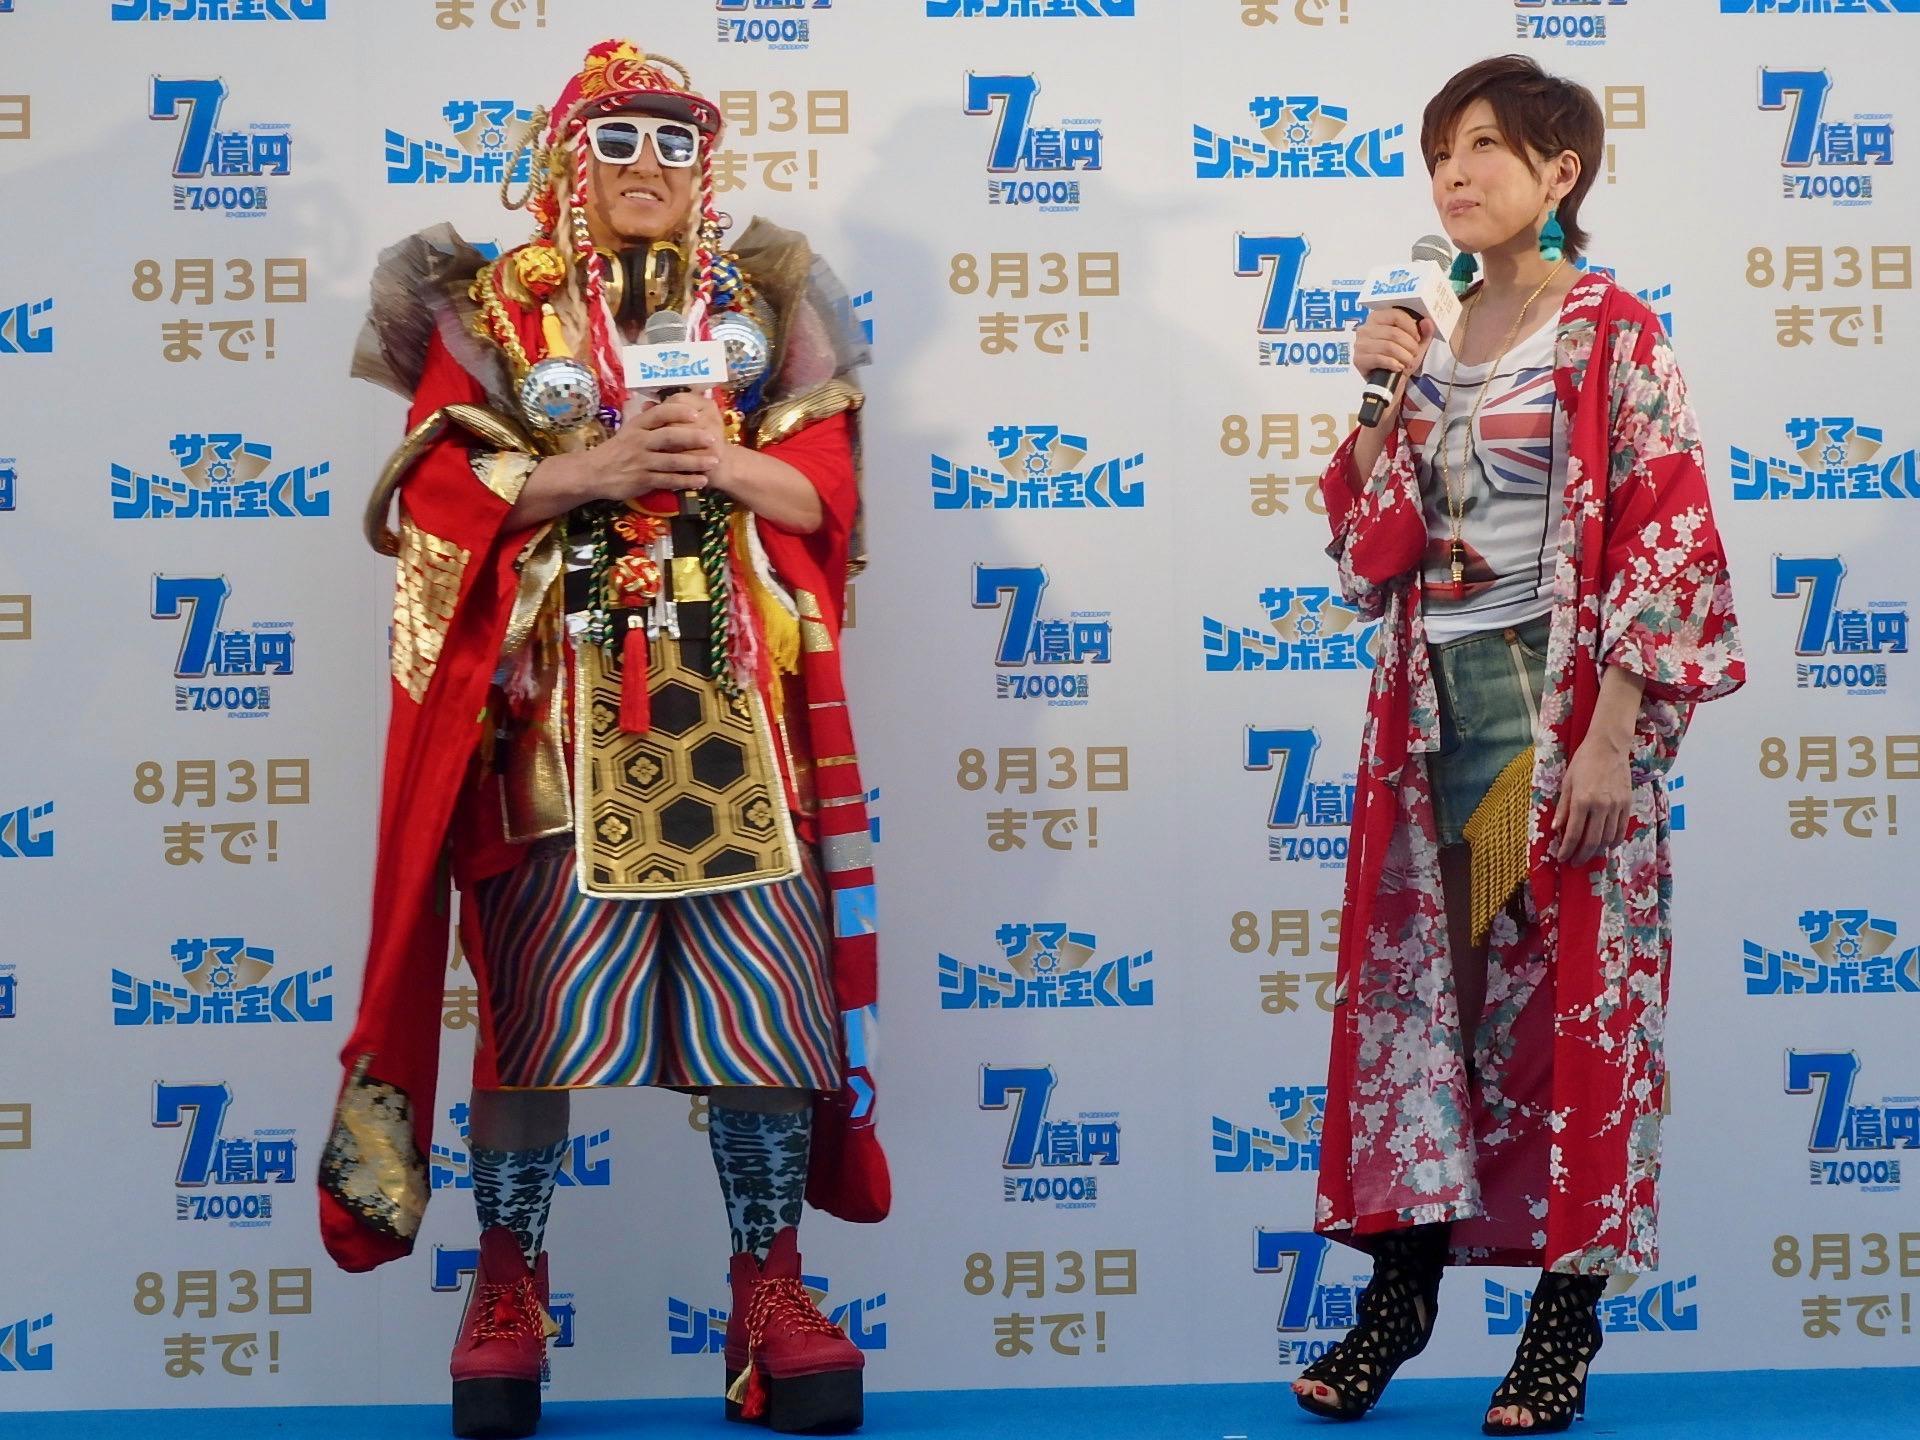 http://news.yoshimoto.co.jp/20180709202759-97ccf45b54797b821cb8e7501fbc1cb5fdfe11f3.jpg